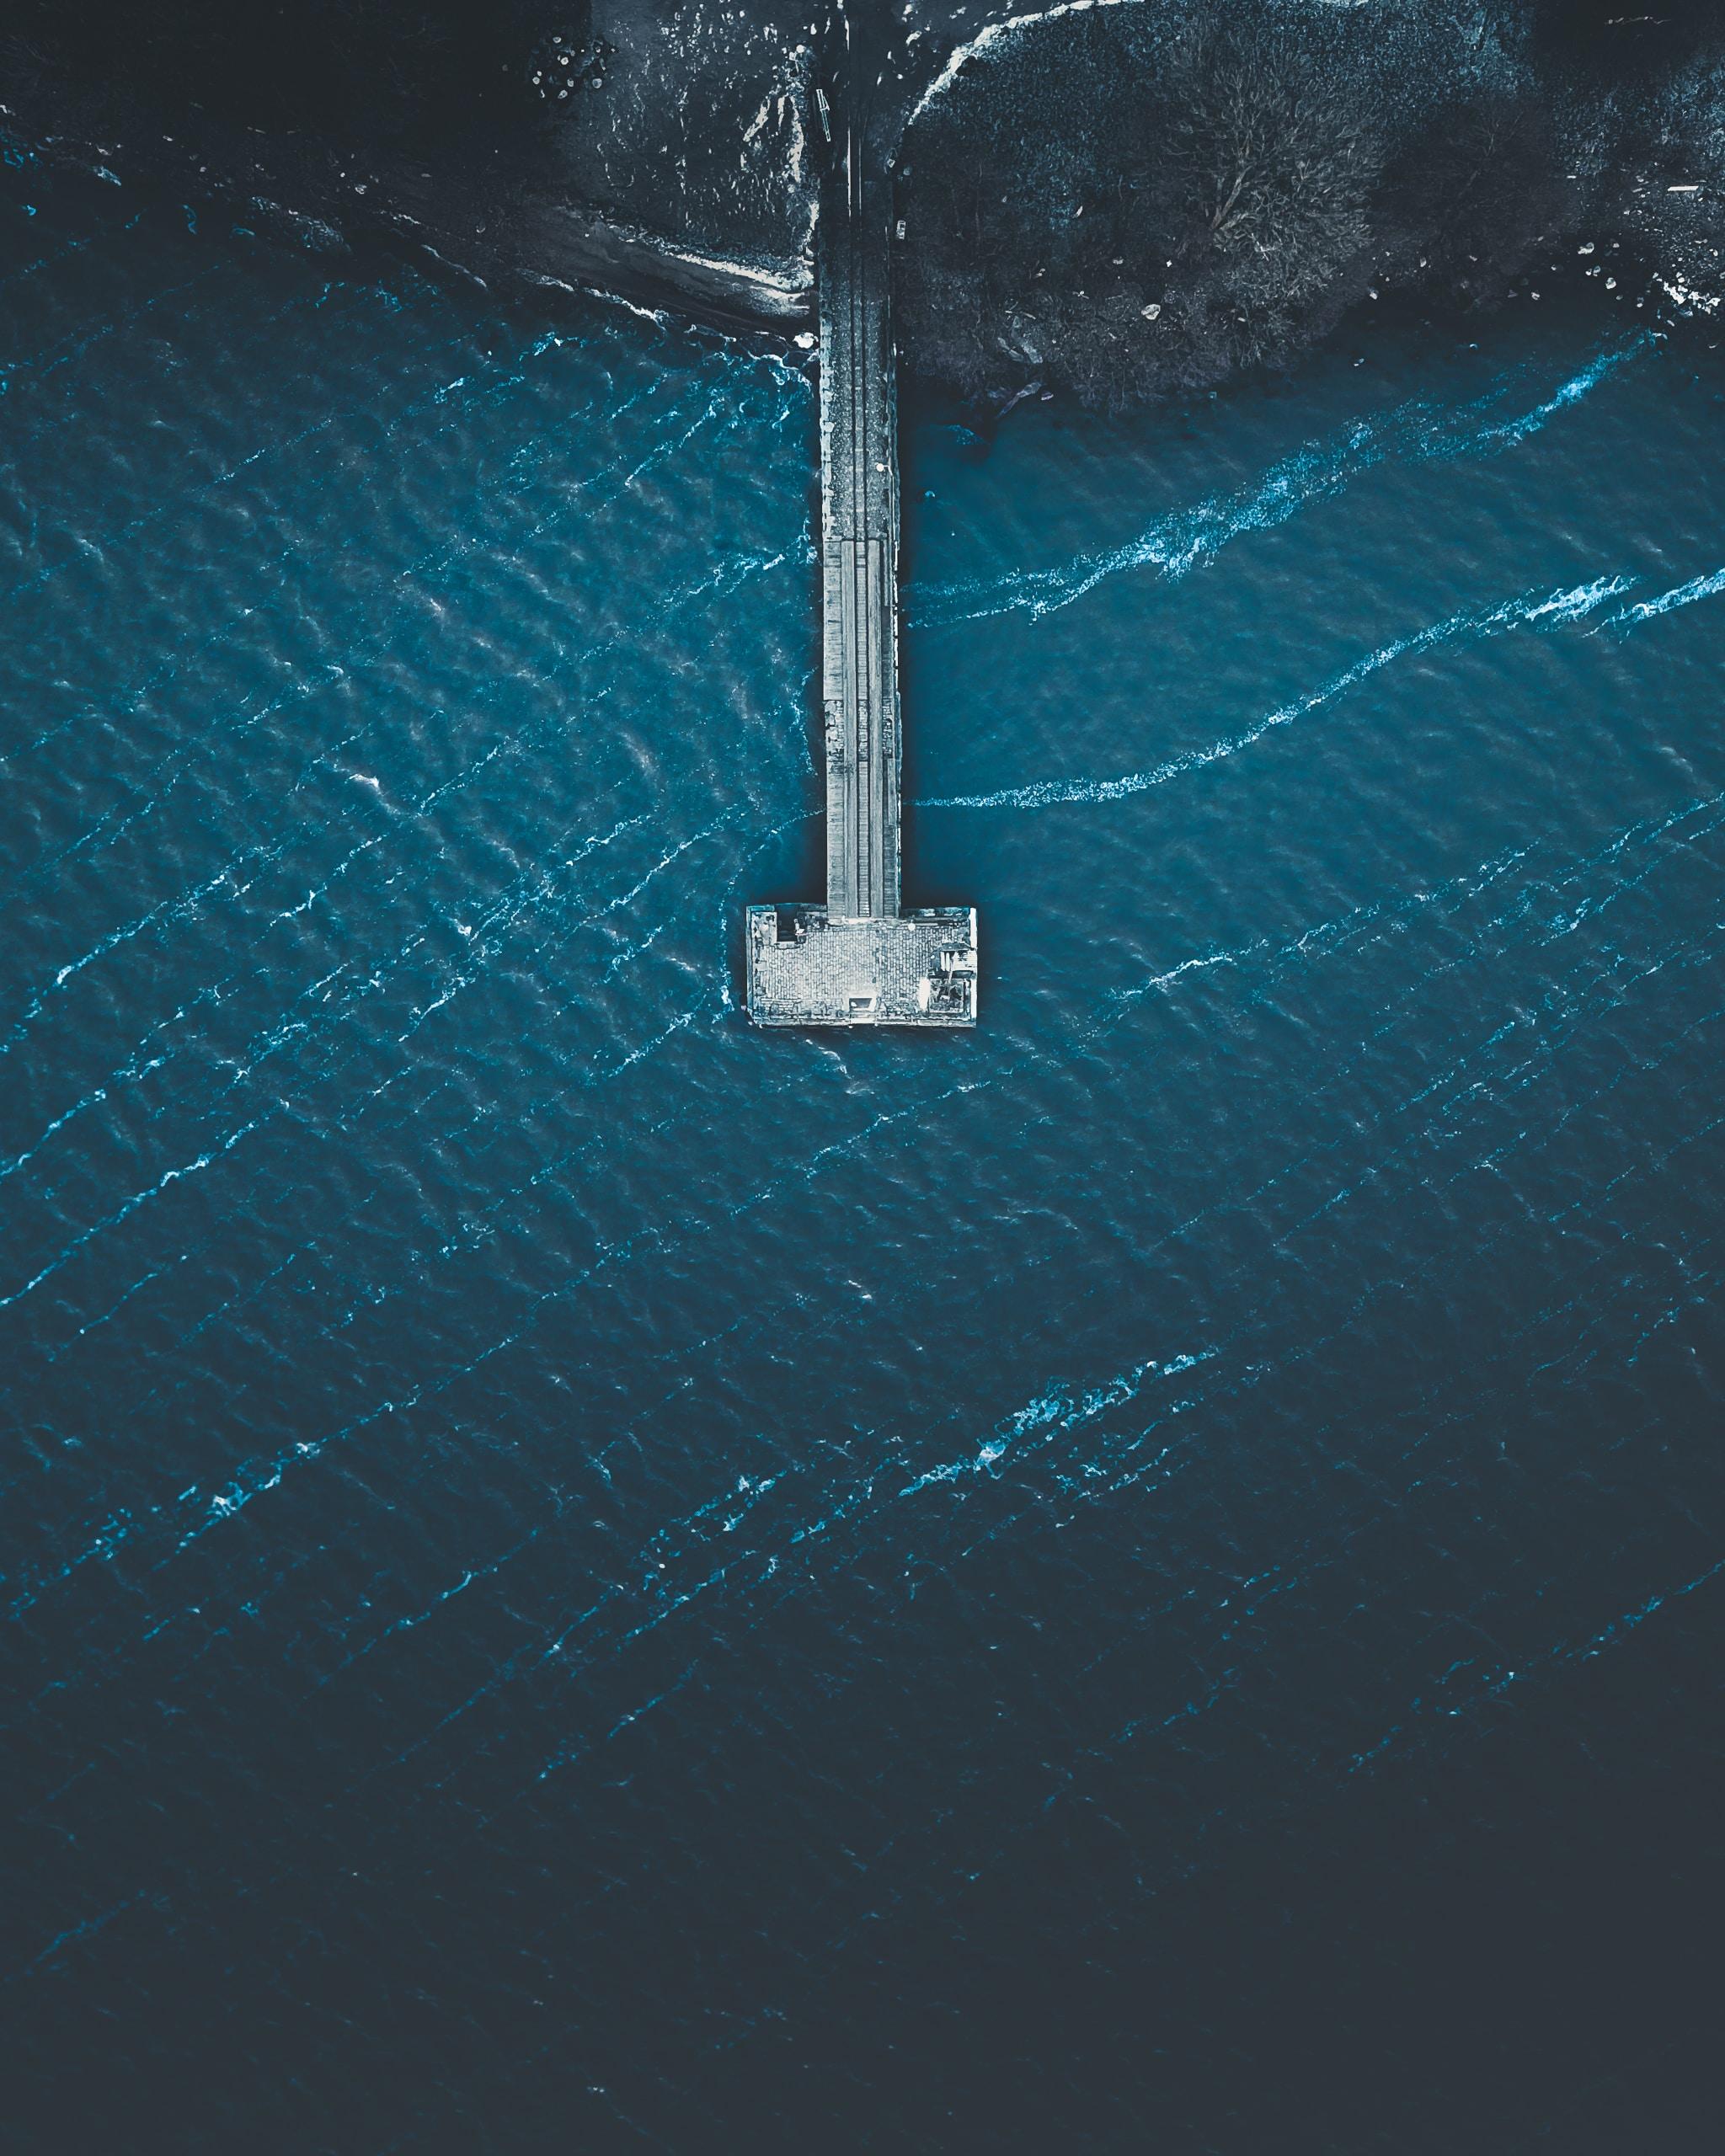 aerial photo of pier